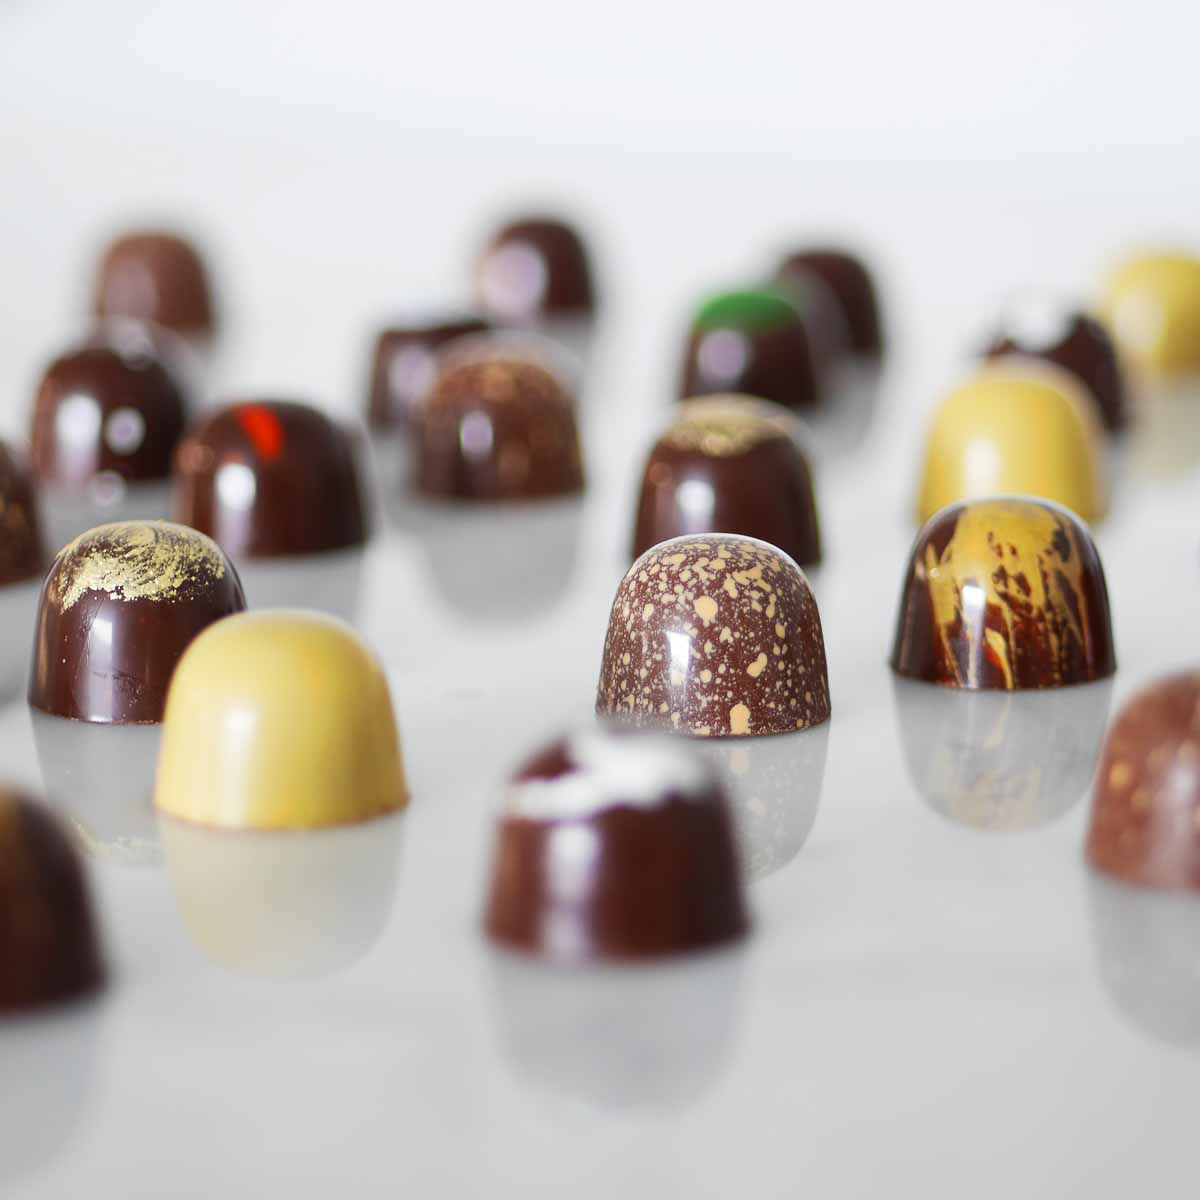 Löw Delights Gourmet Schokolade aus Zürich-4